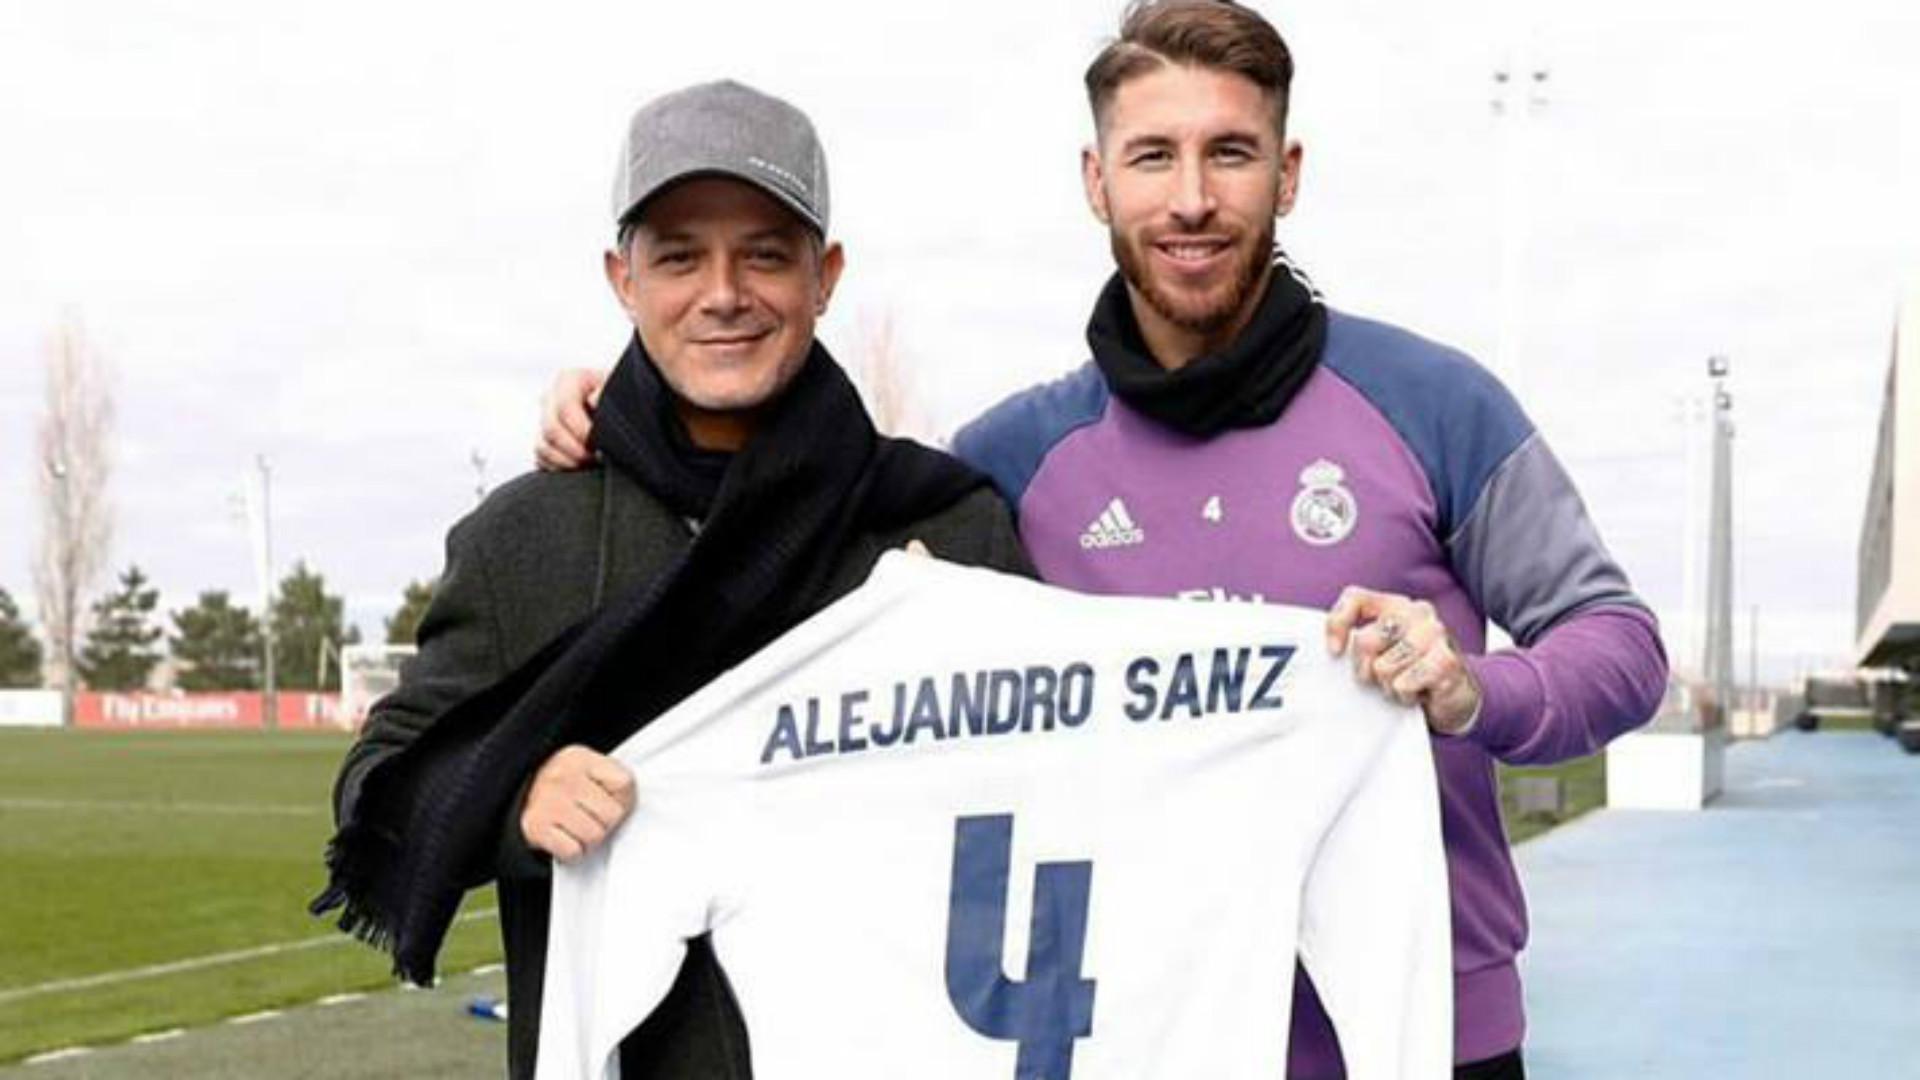 Alejandro Sanz Sergio Ramos